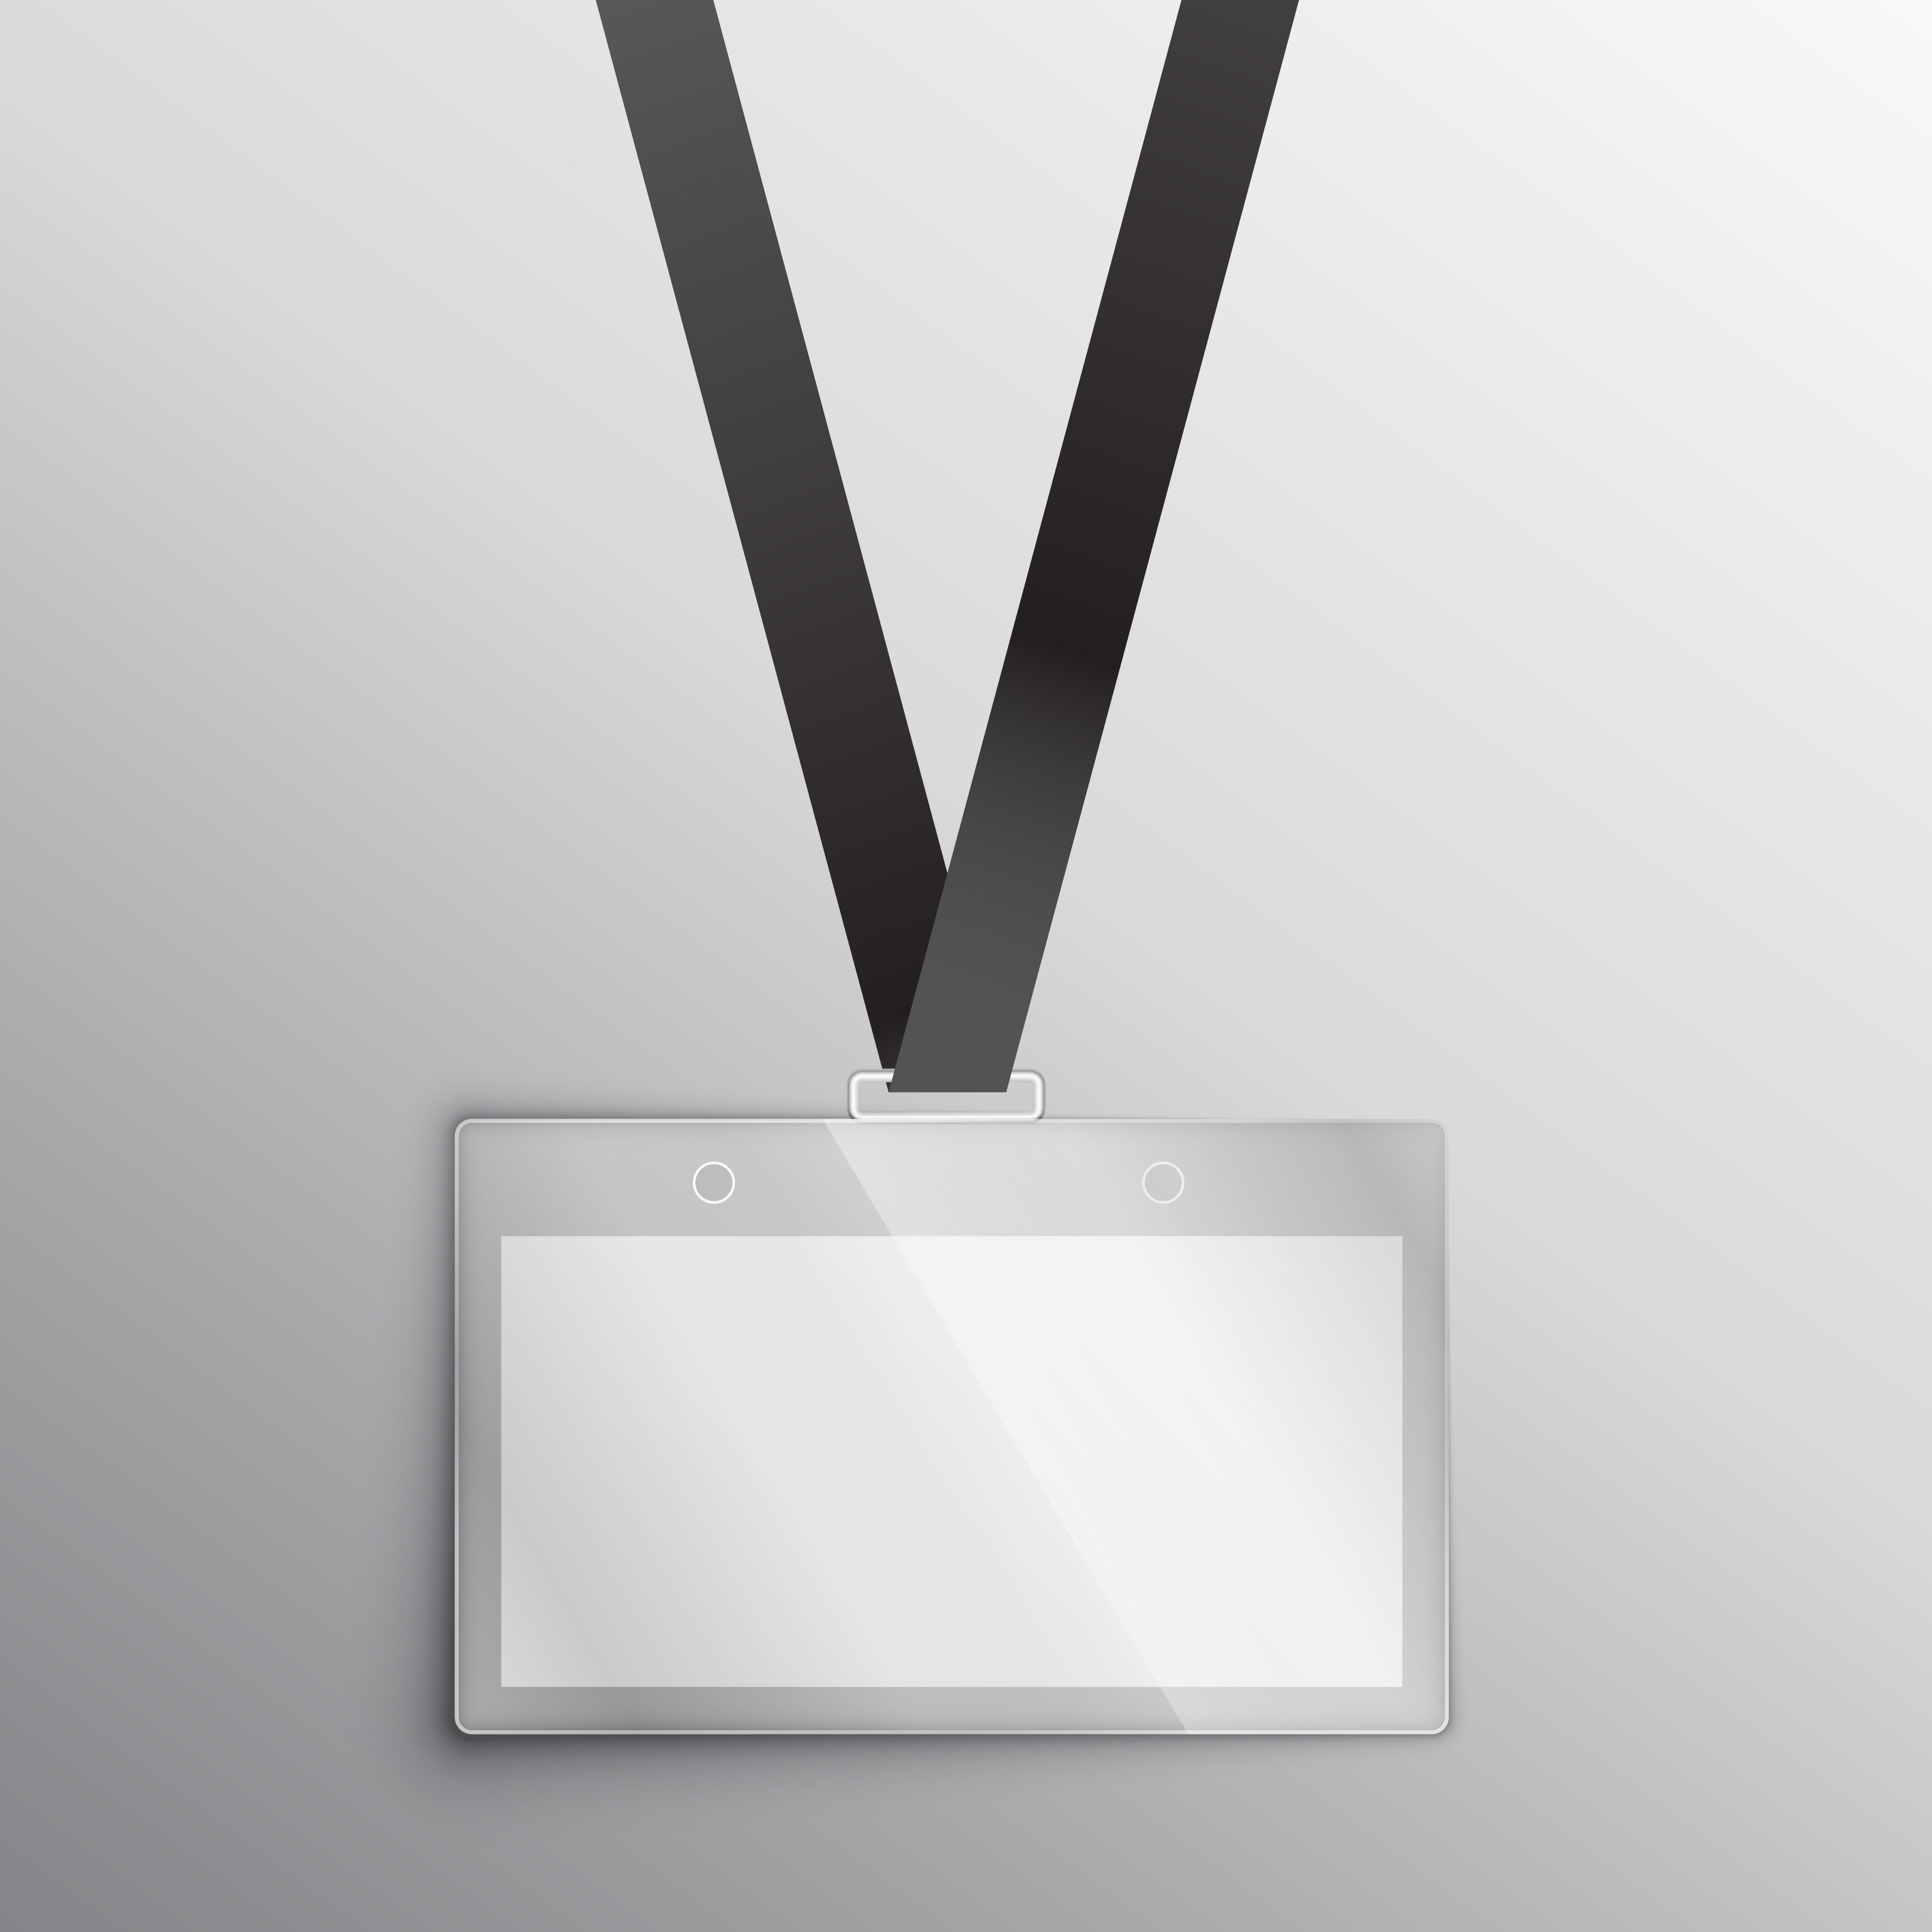 lanyard with badge, access card design mockup - Download Free Vector ...